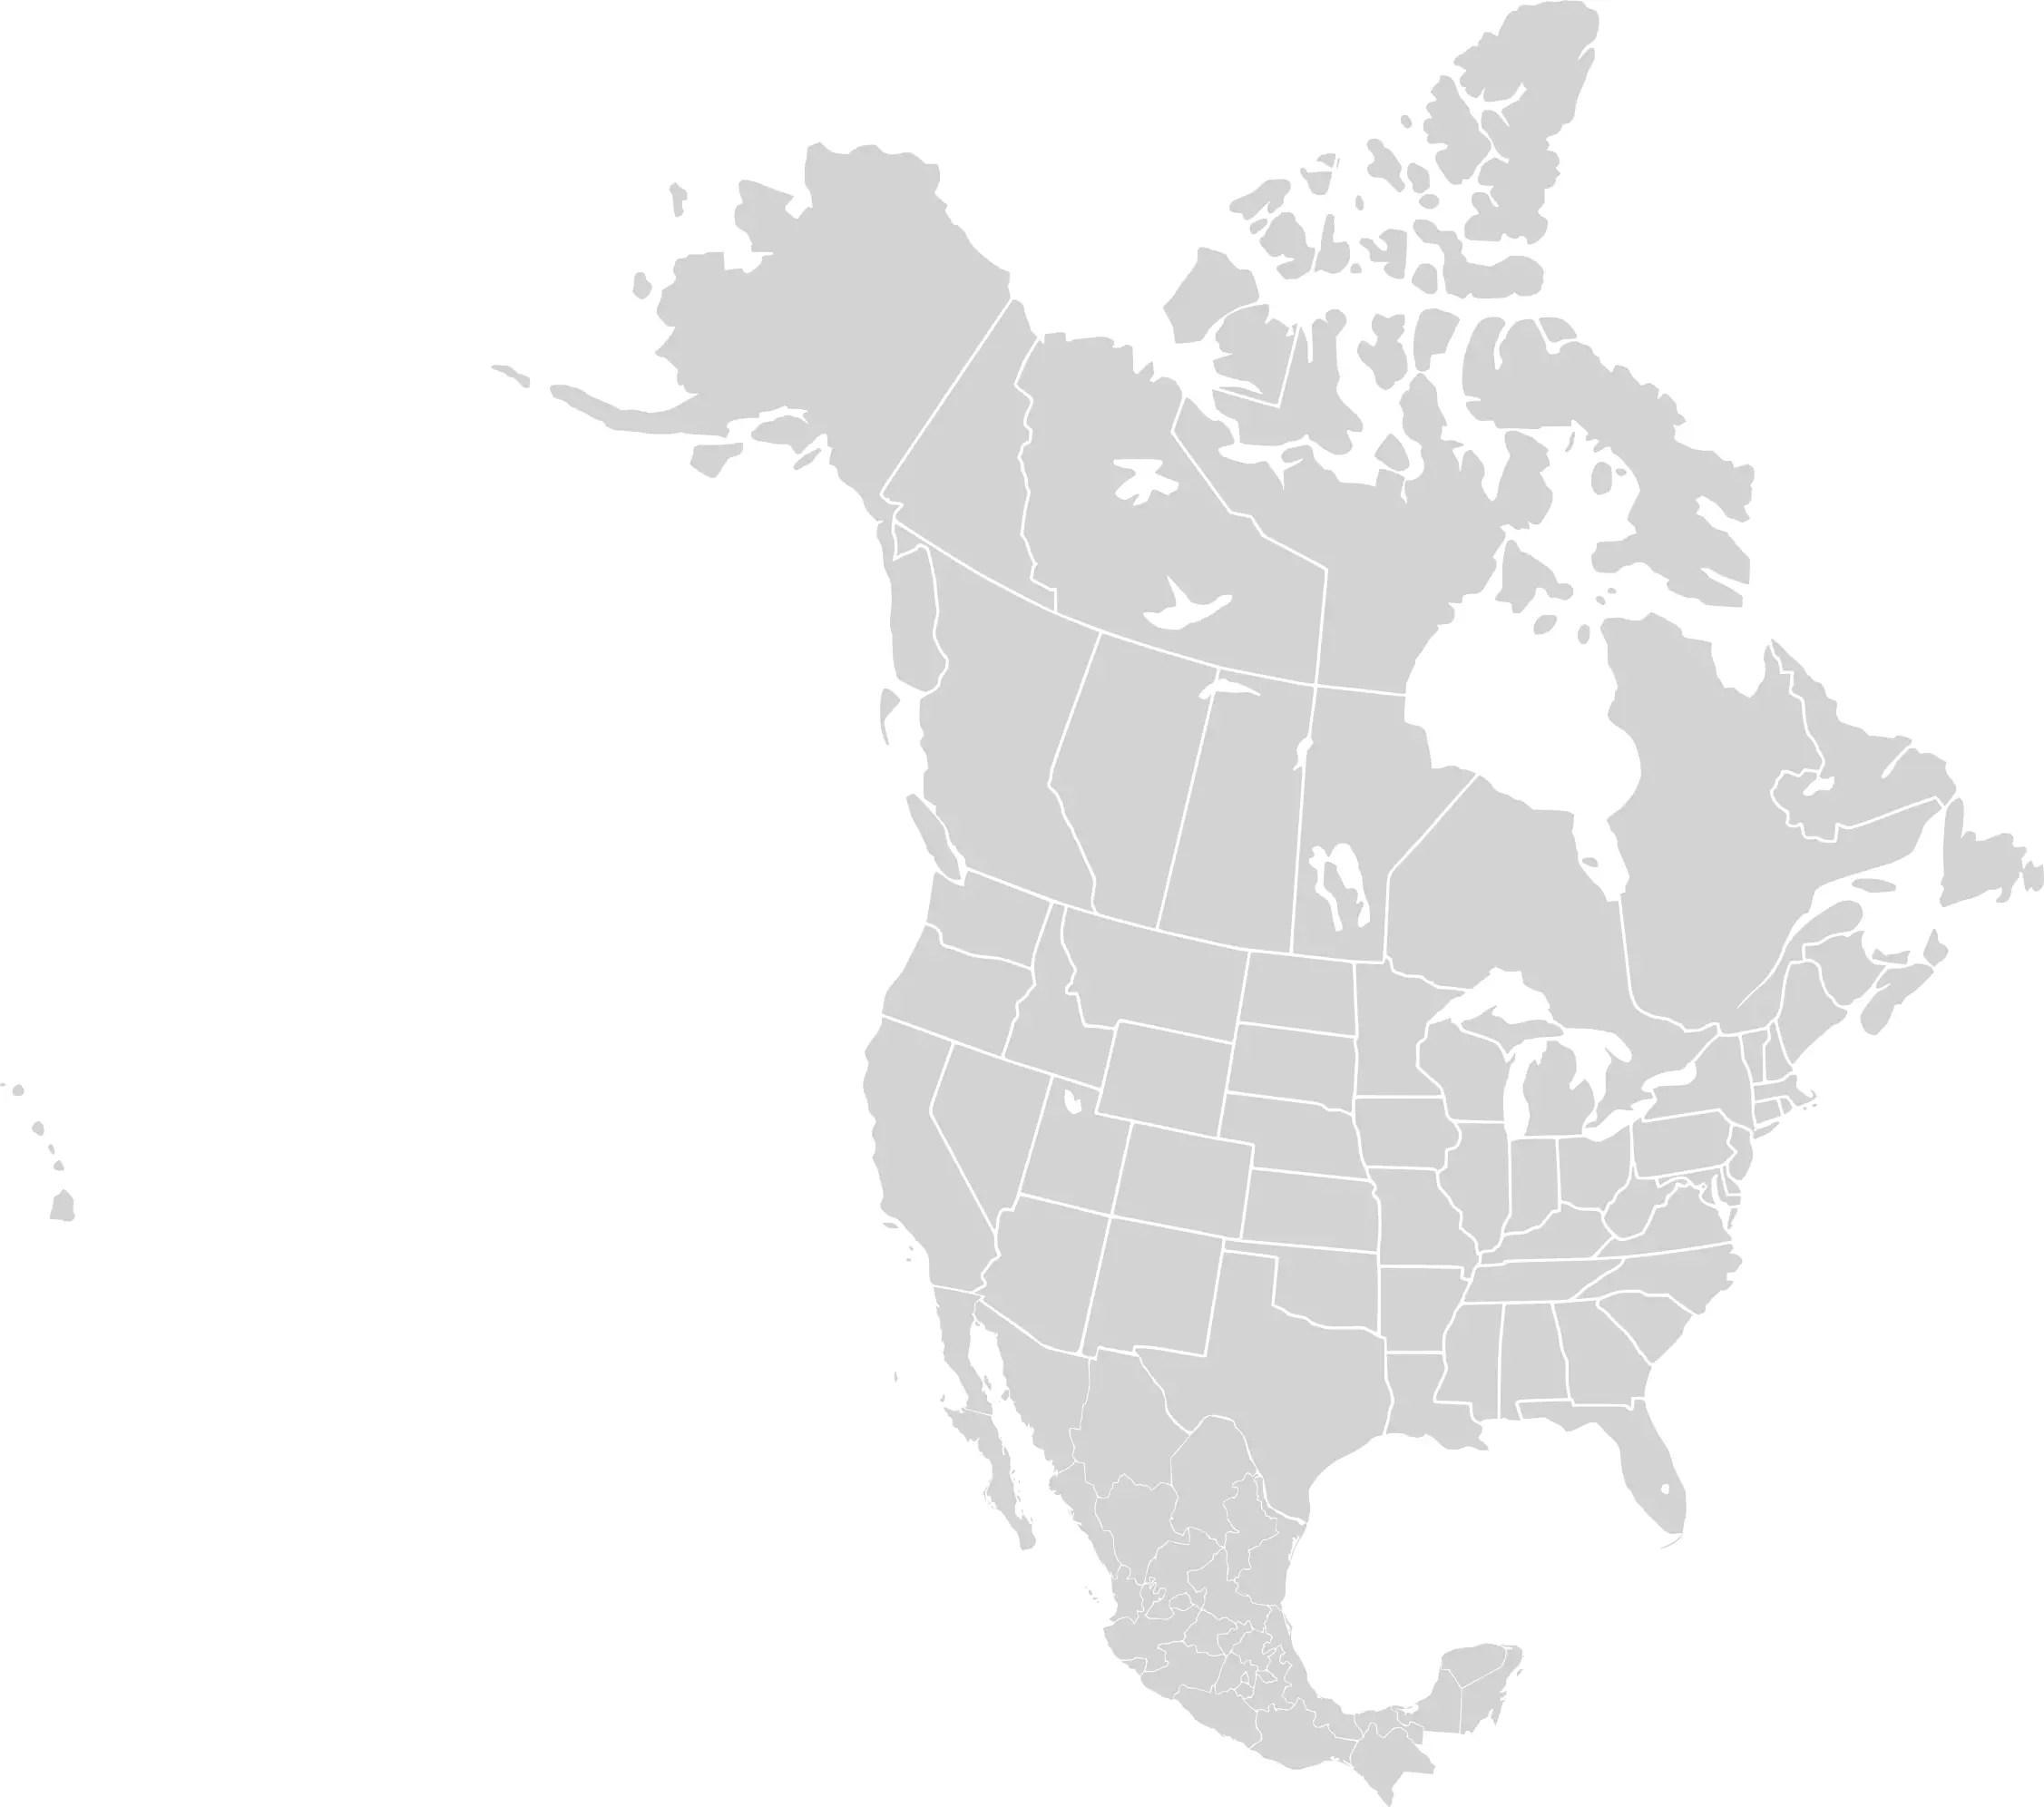 North America Blank Range Map Mapsof